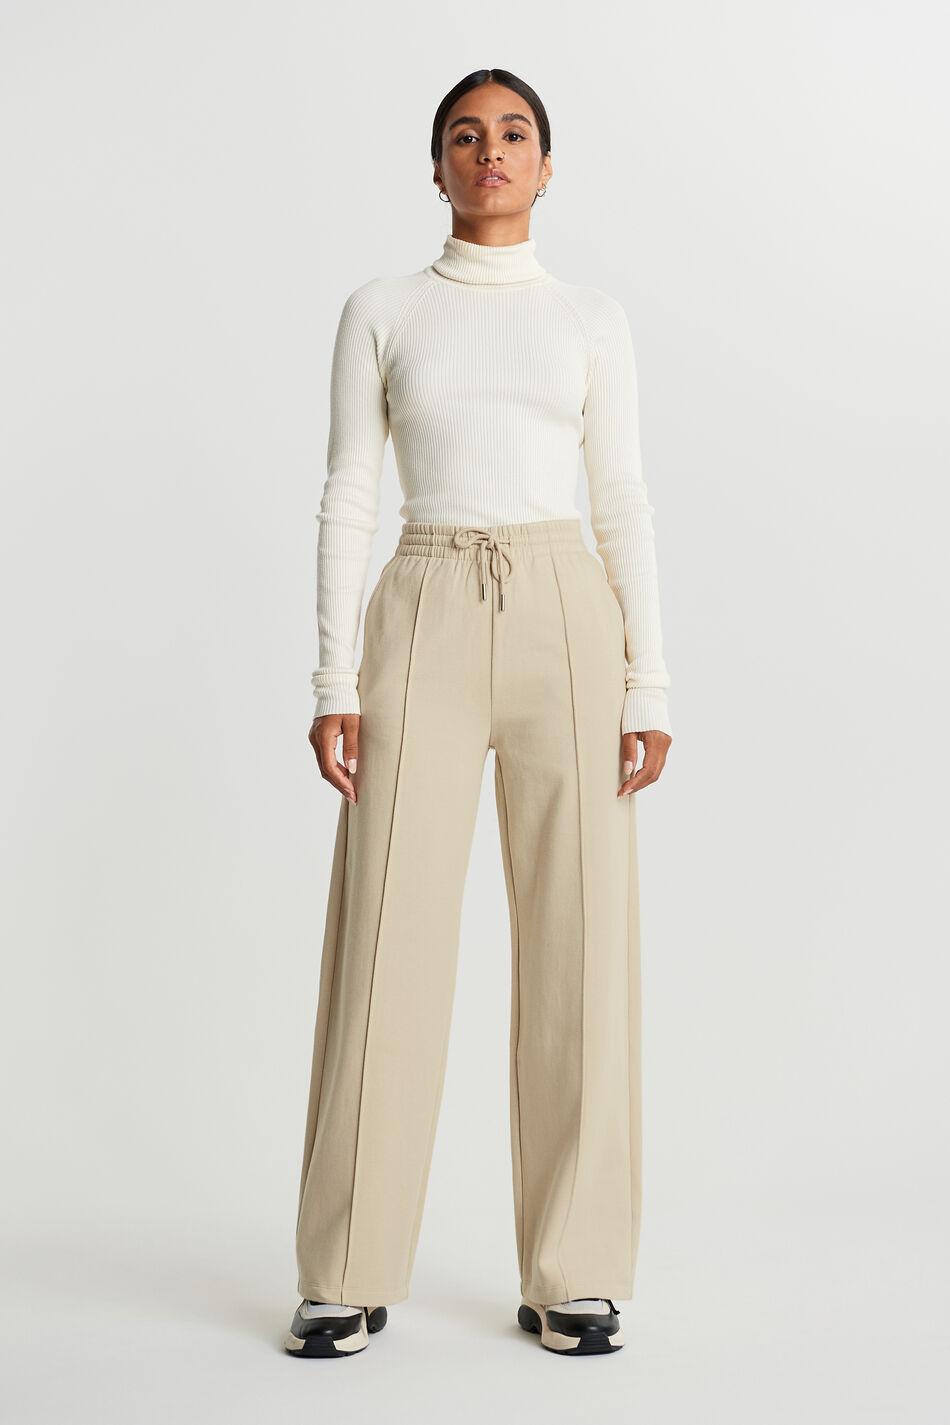 Gina Tricot Bonnie sweatpants L Female Brown rice (7316)